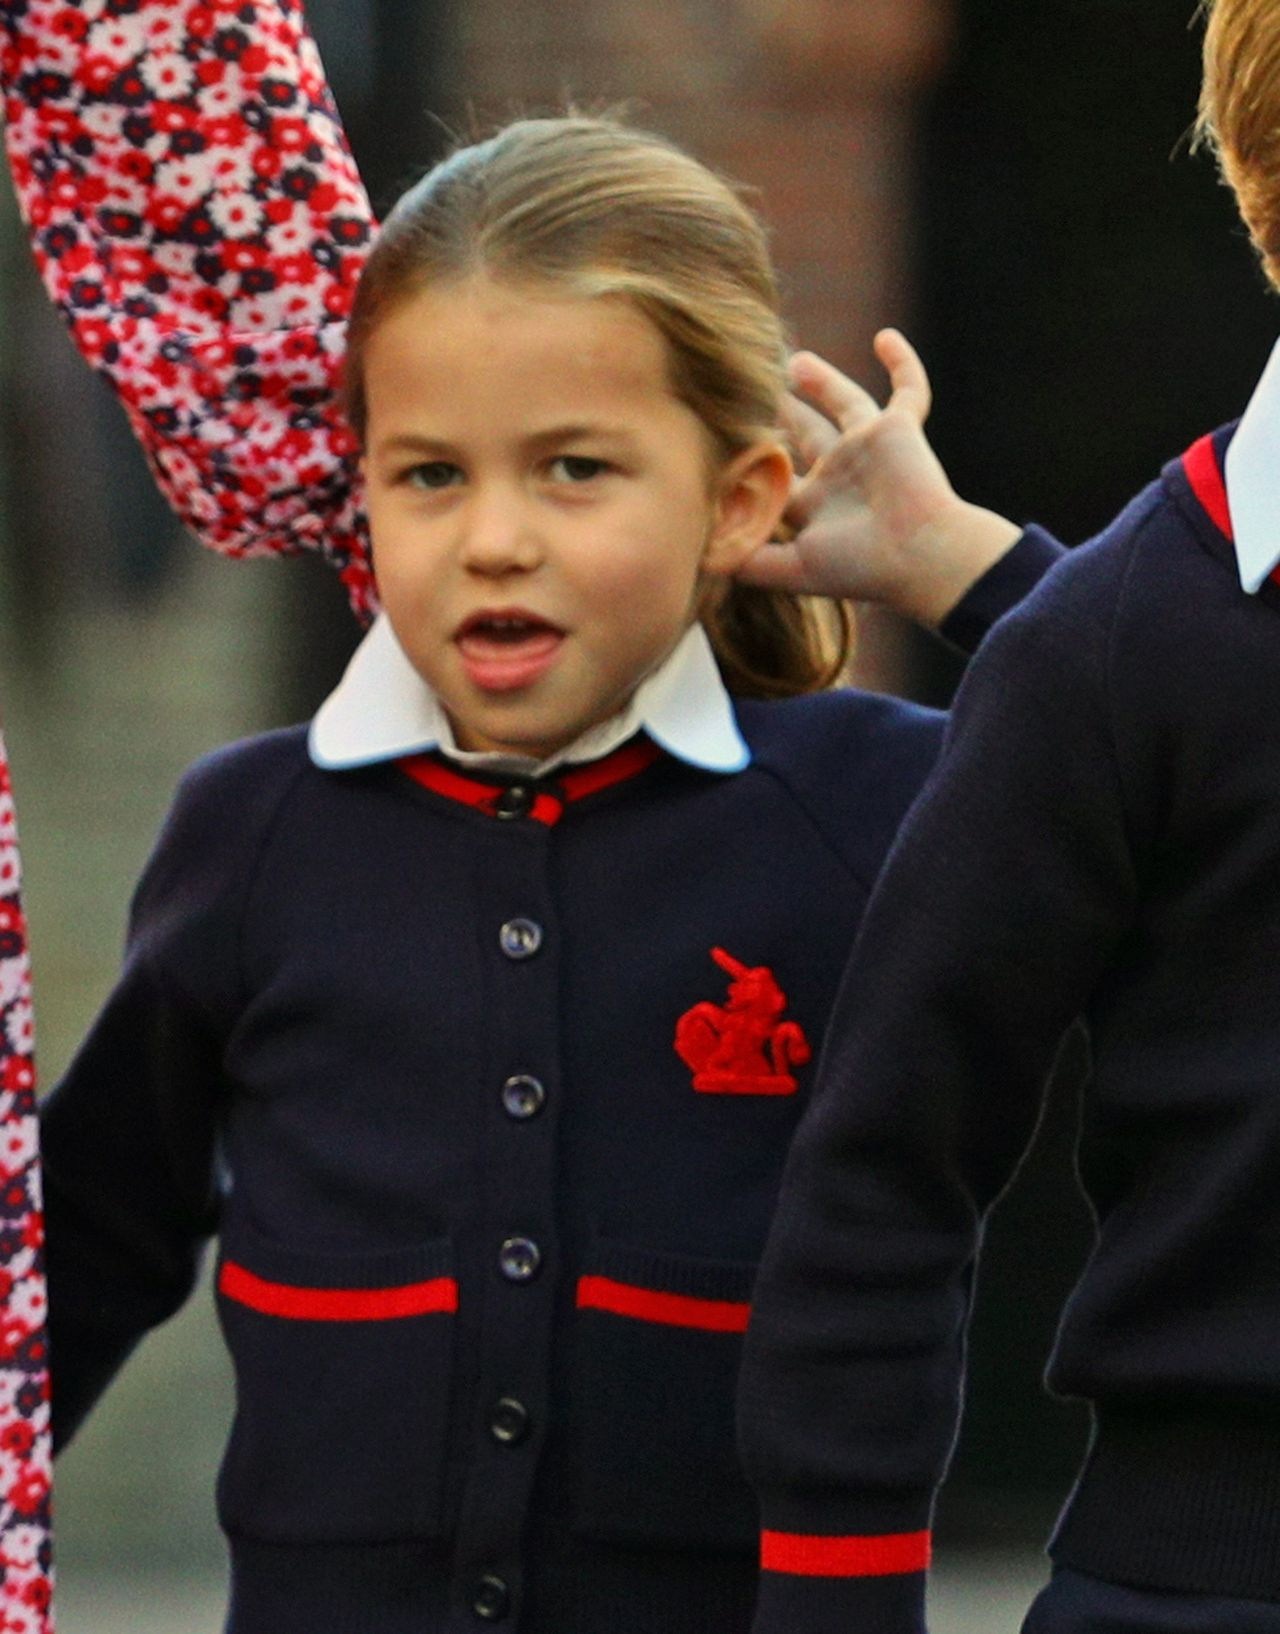 Księżniczka Charlotte stroi miny